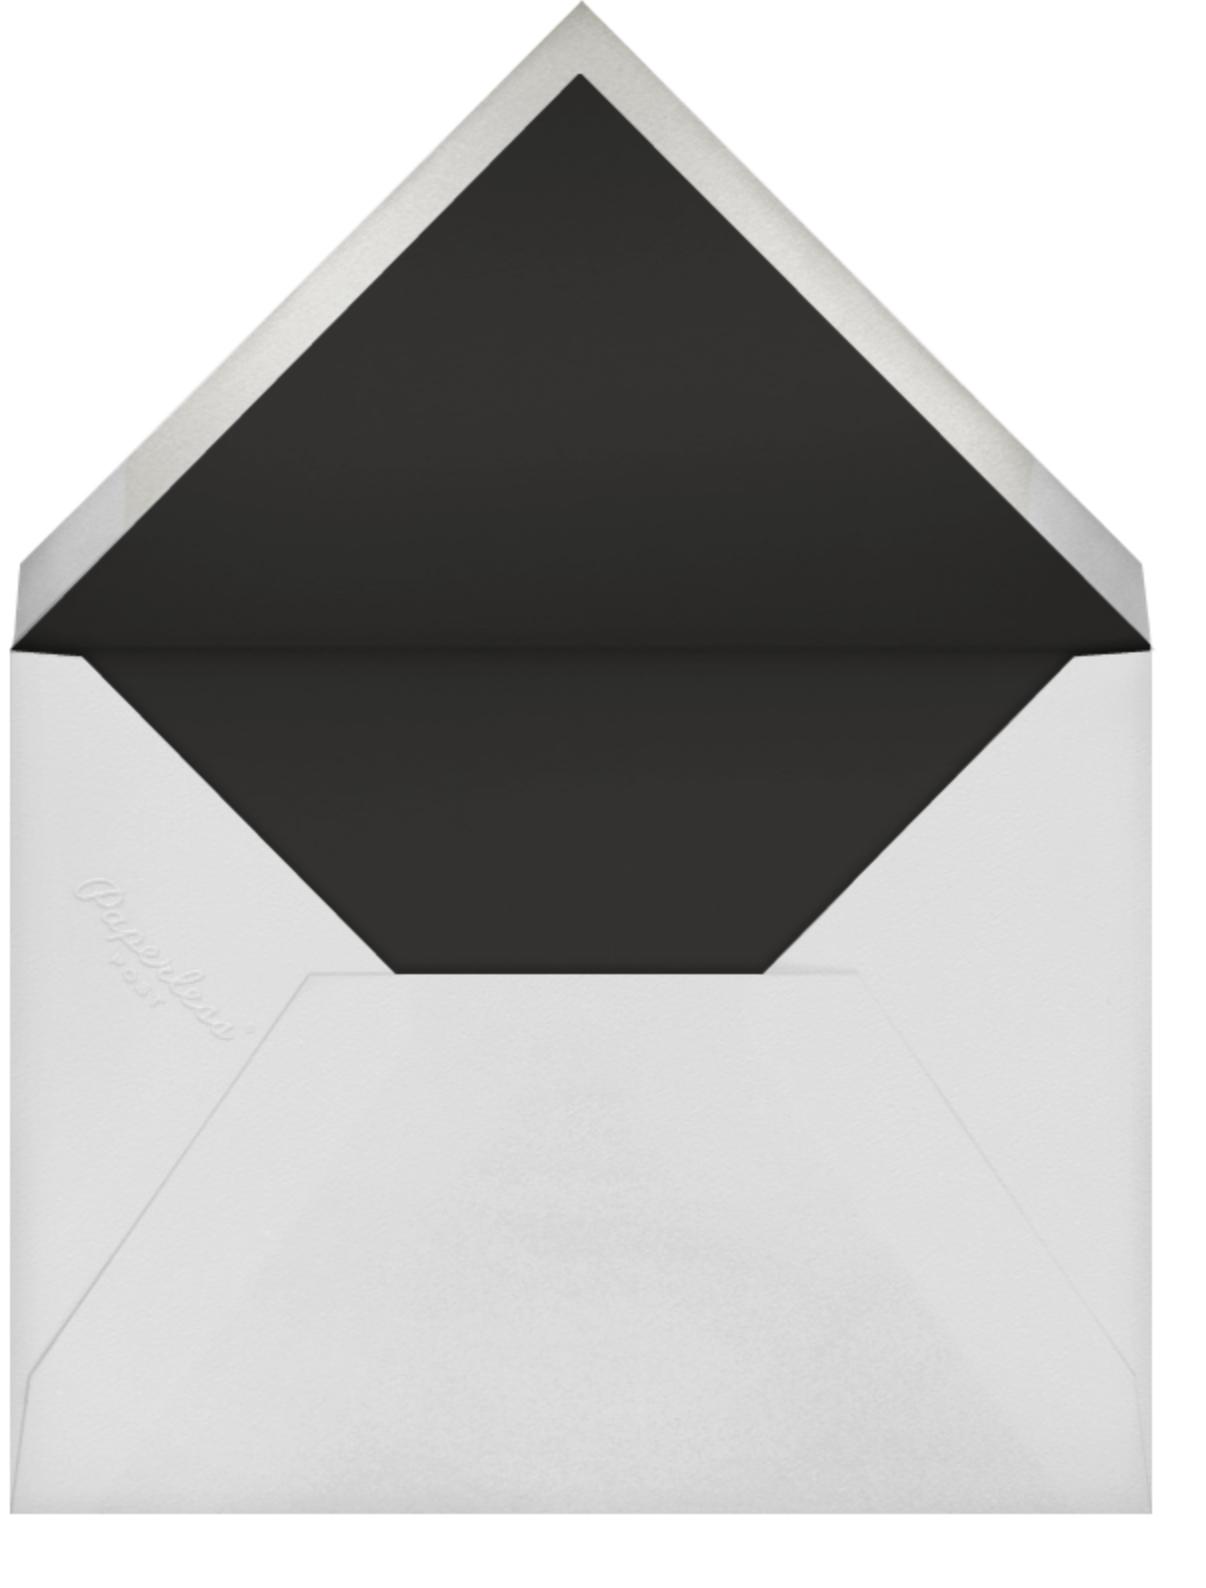 Richmond Park (Stationery) - Navy/Silver - Oscar de la Renta - Envelope